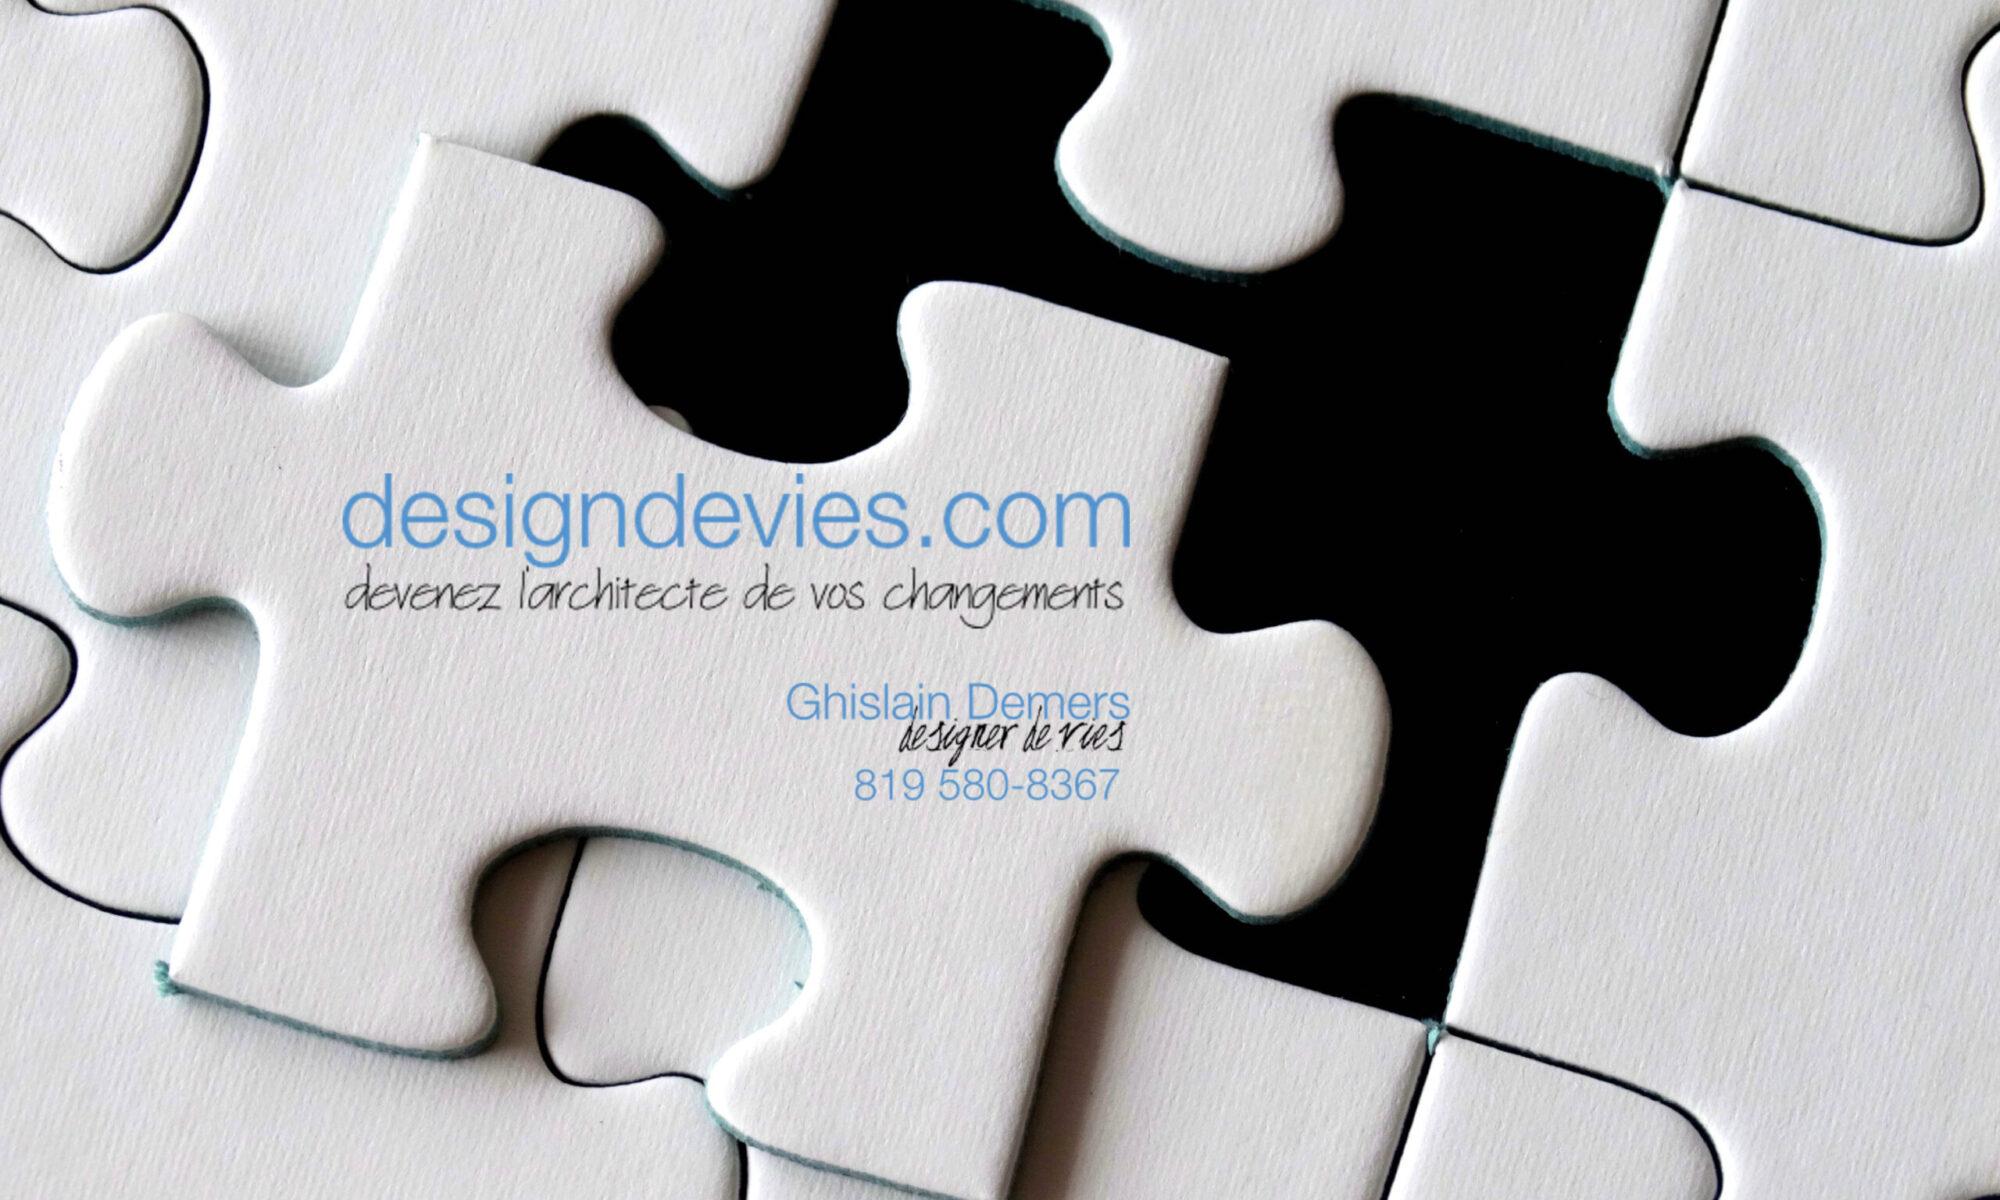 Design de vies